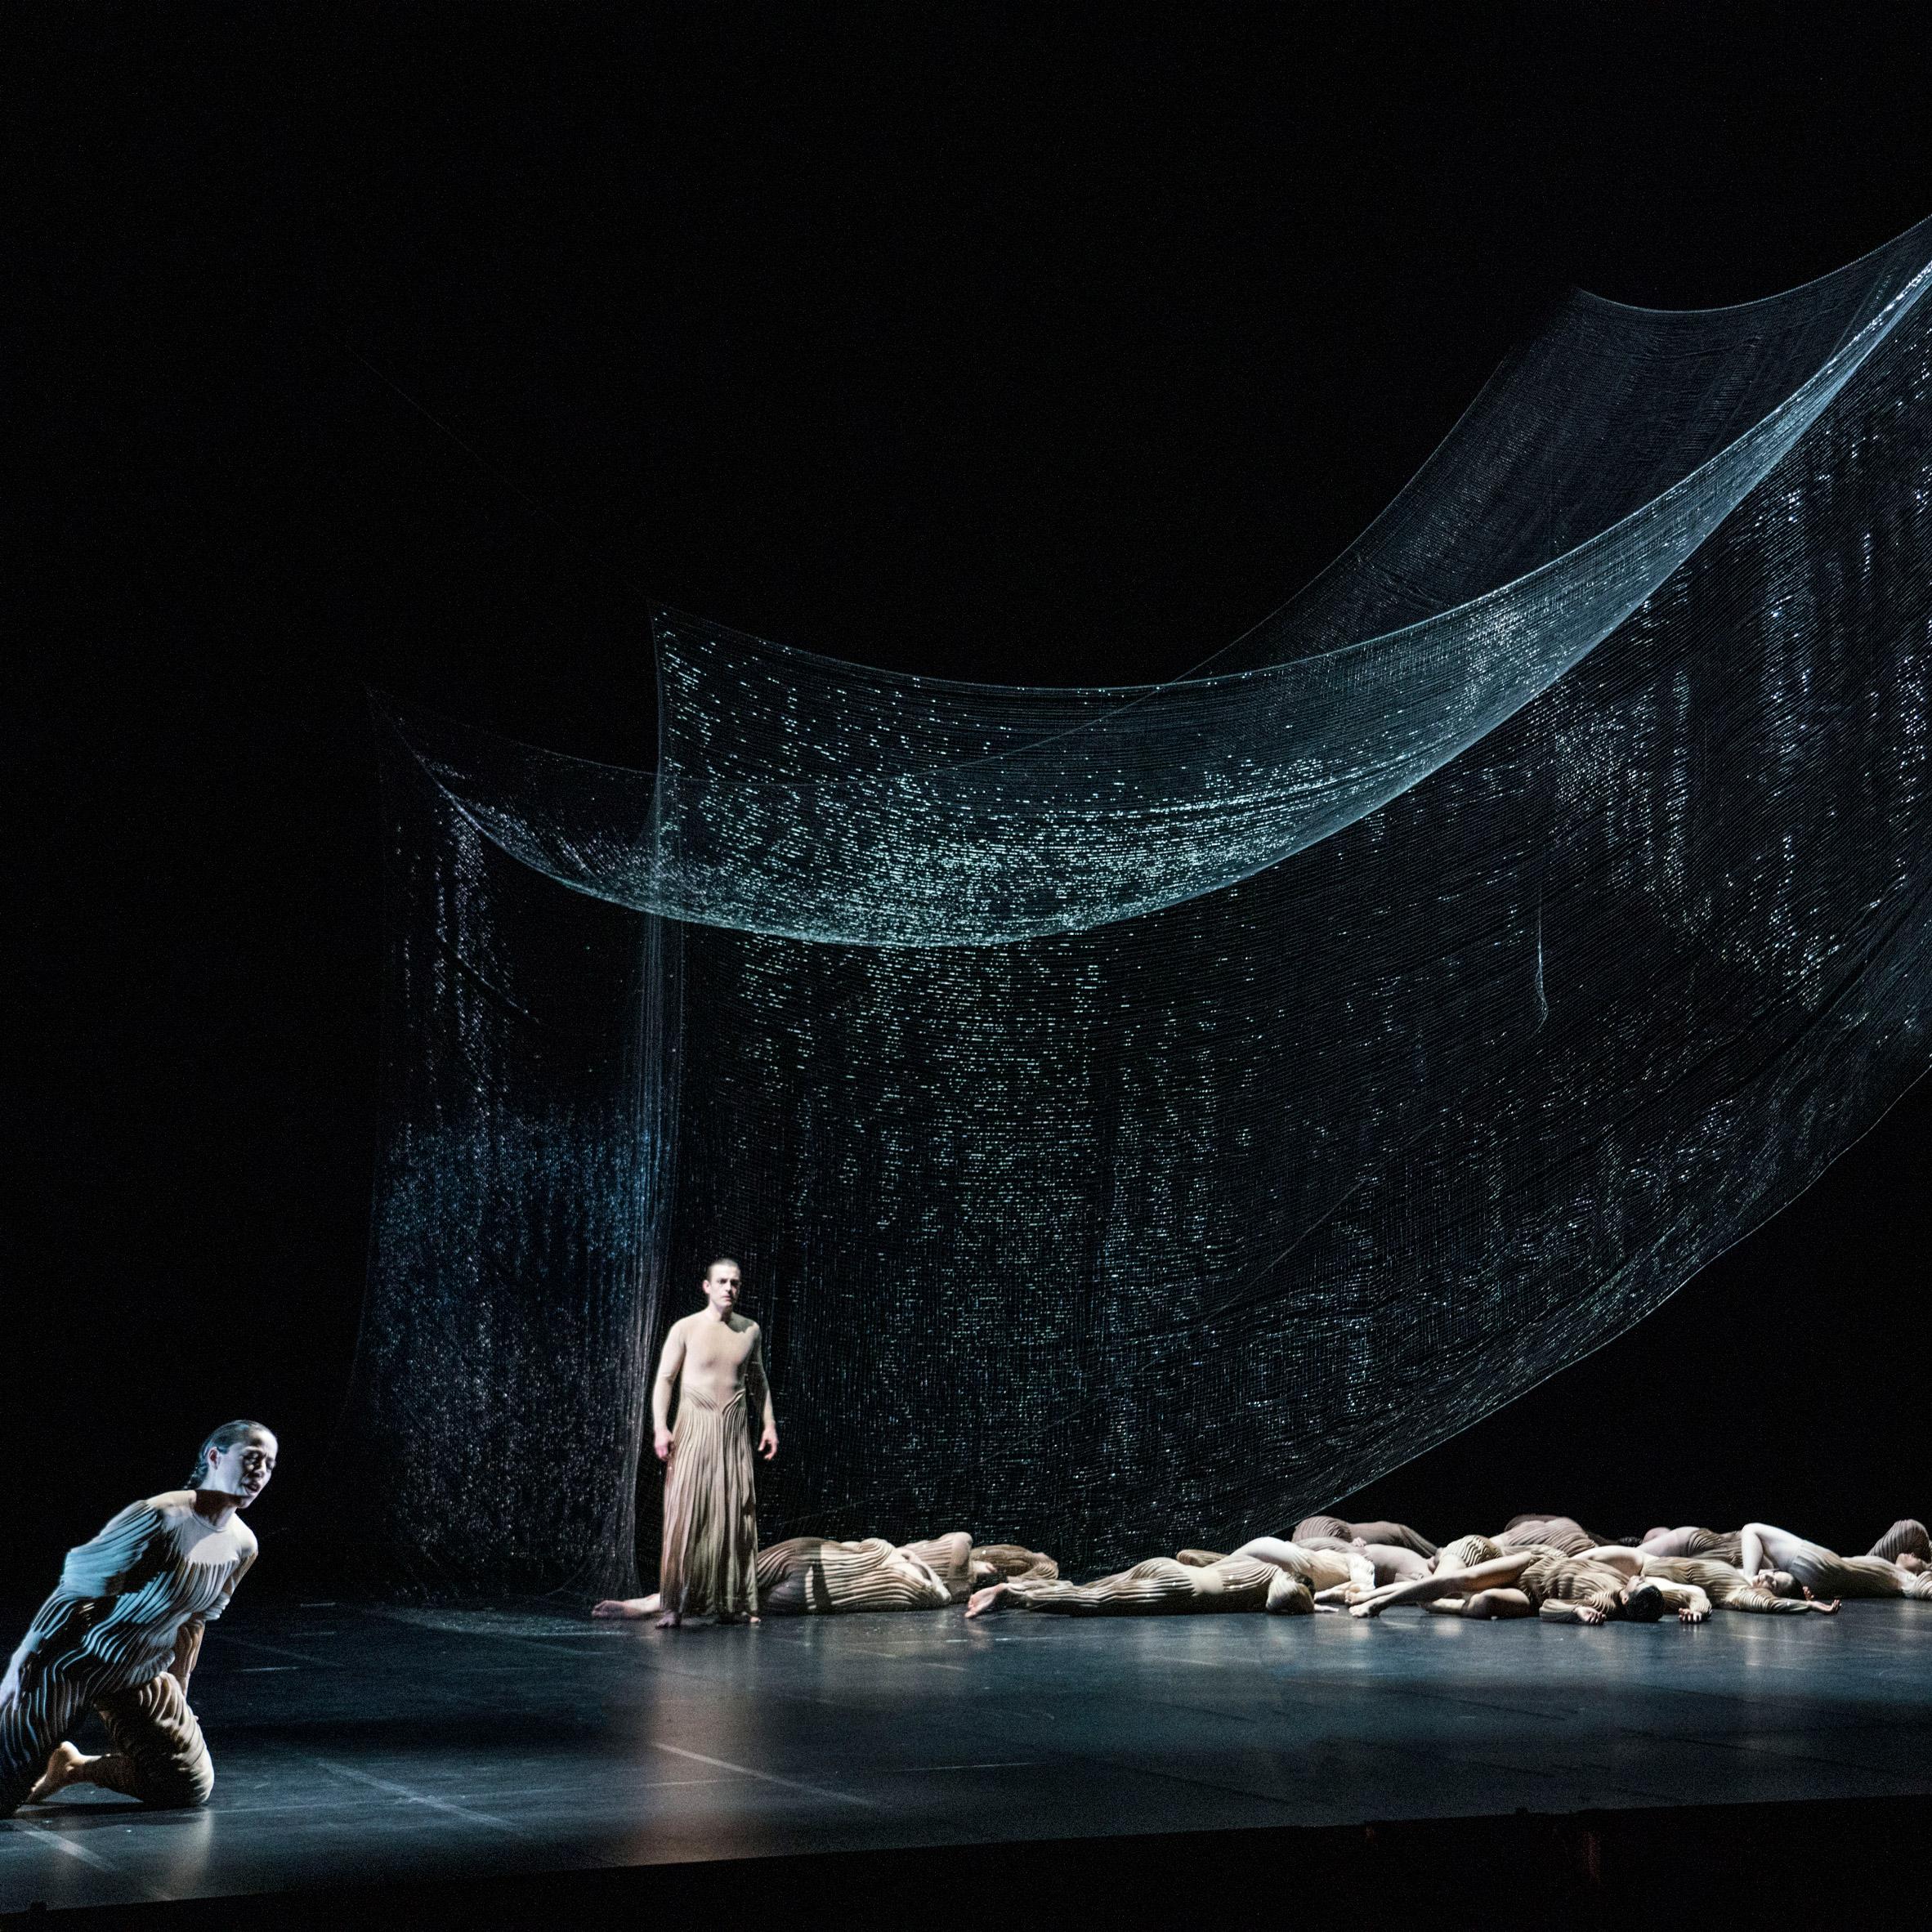 Studio Drift creates dramatic shifting Ego sculpture for Dutch opera L'Orfeo